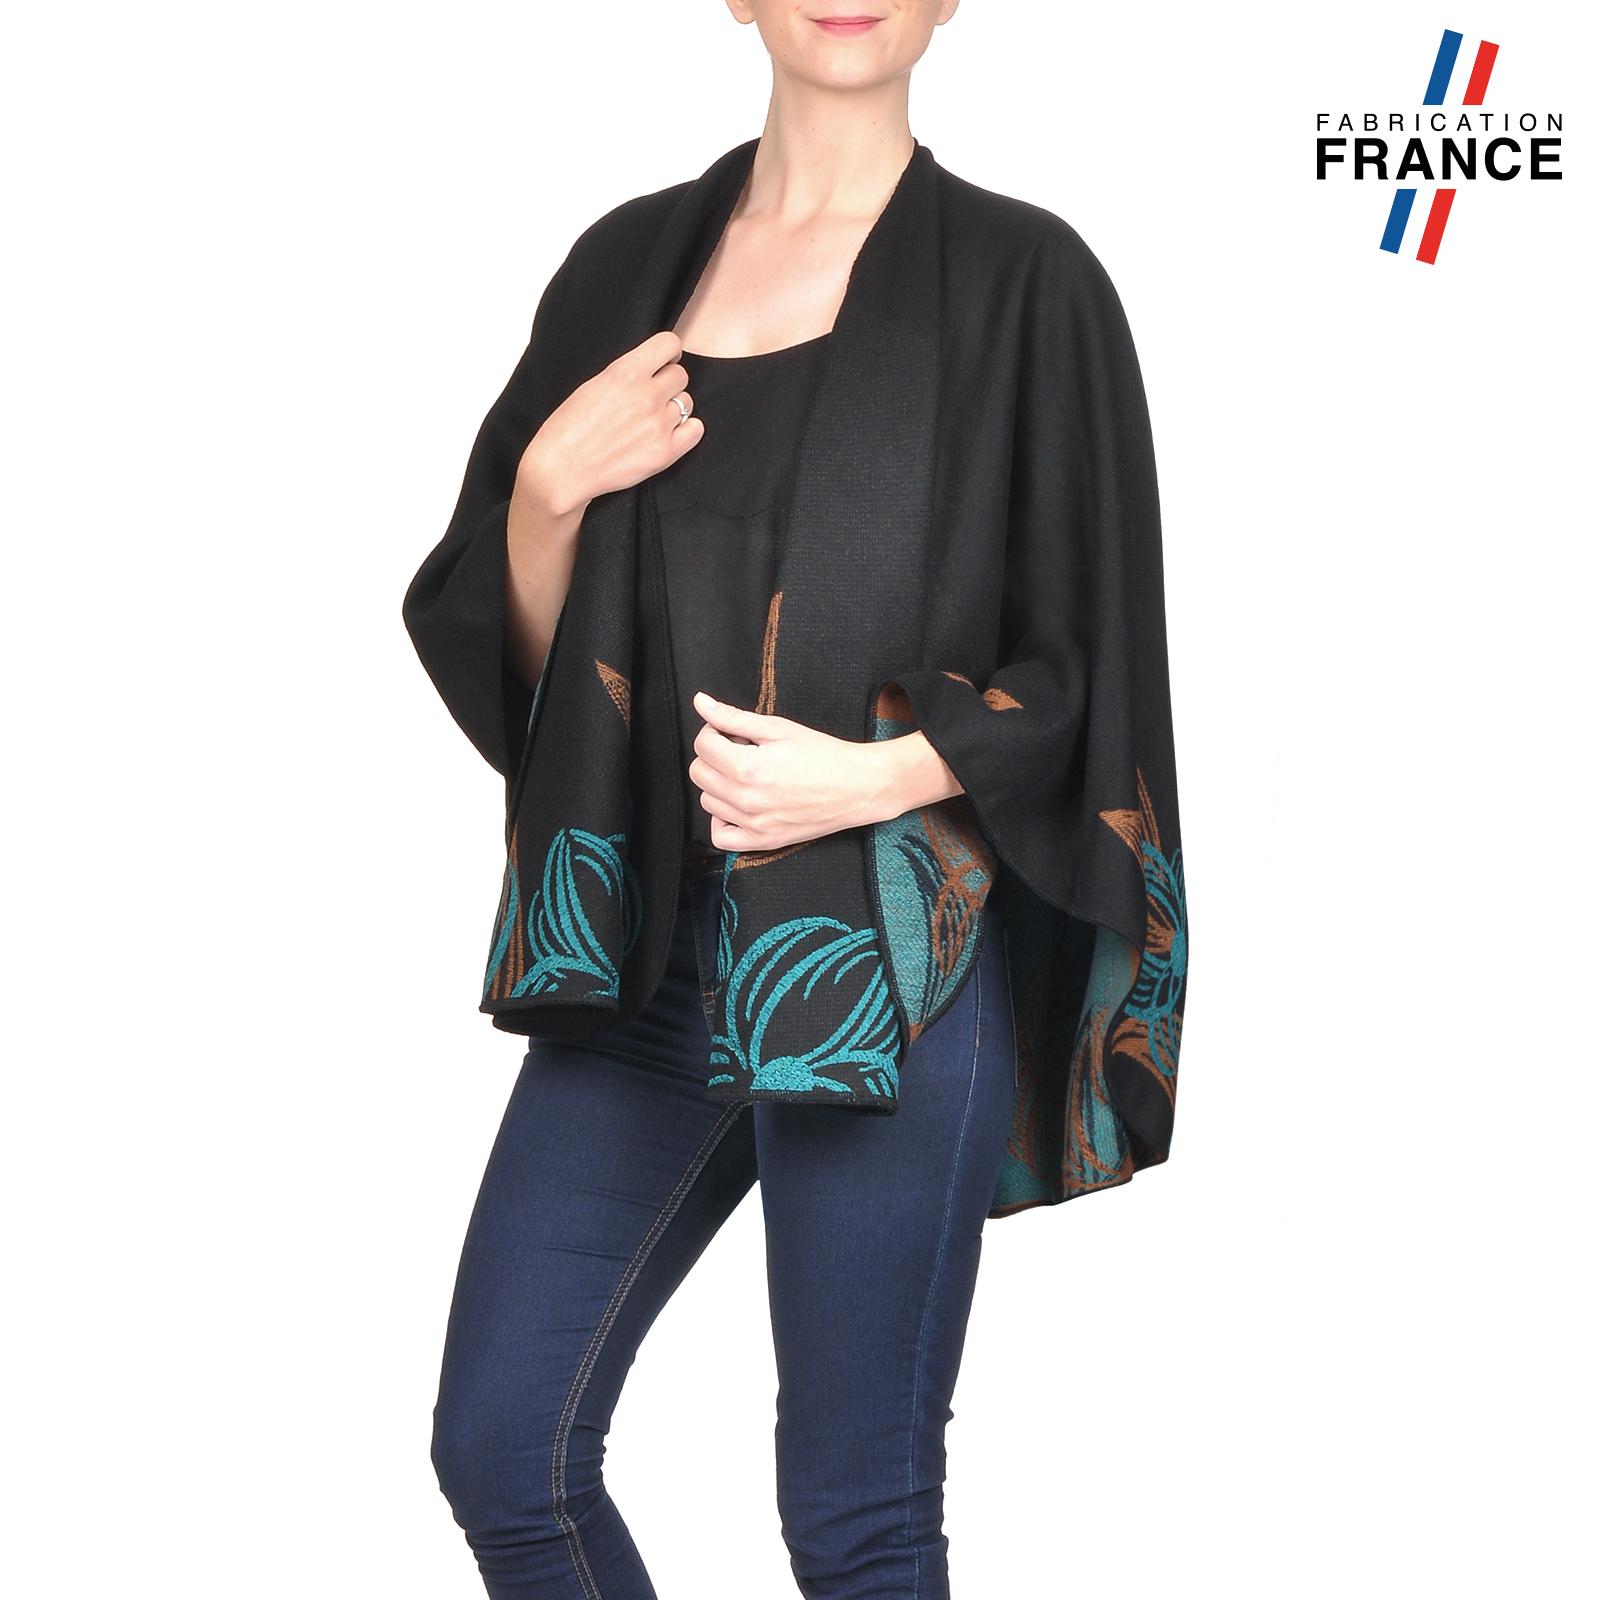 AT-03250-V16-poncho-femme-noir-fleurs-turquoise-fabrique-en-france (1)